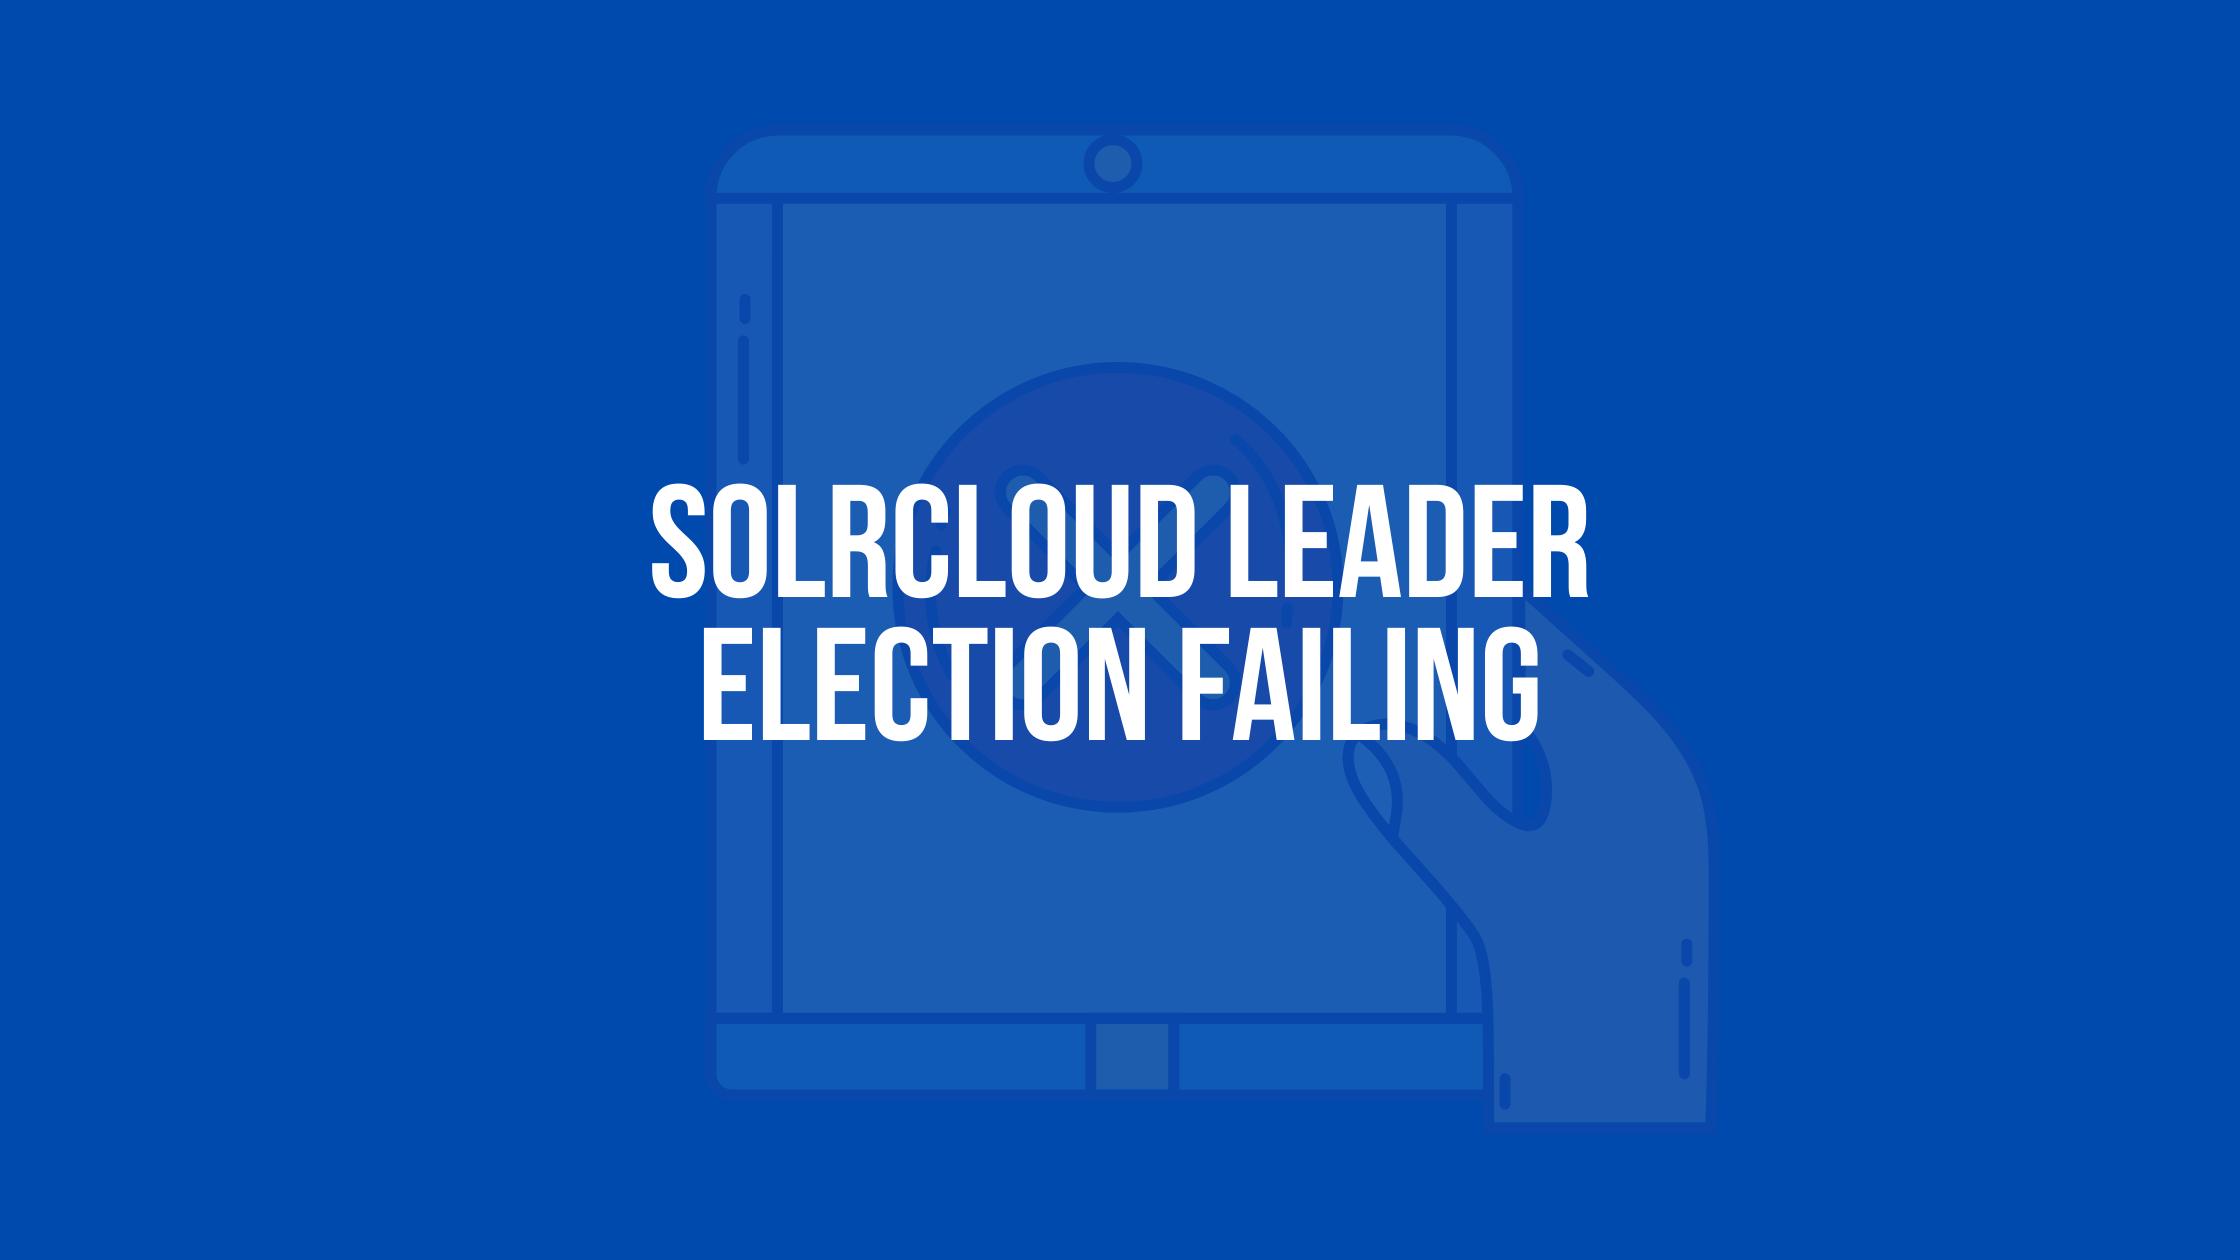 SolrCloud Leader Election Failing